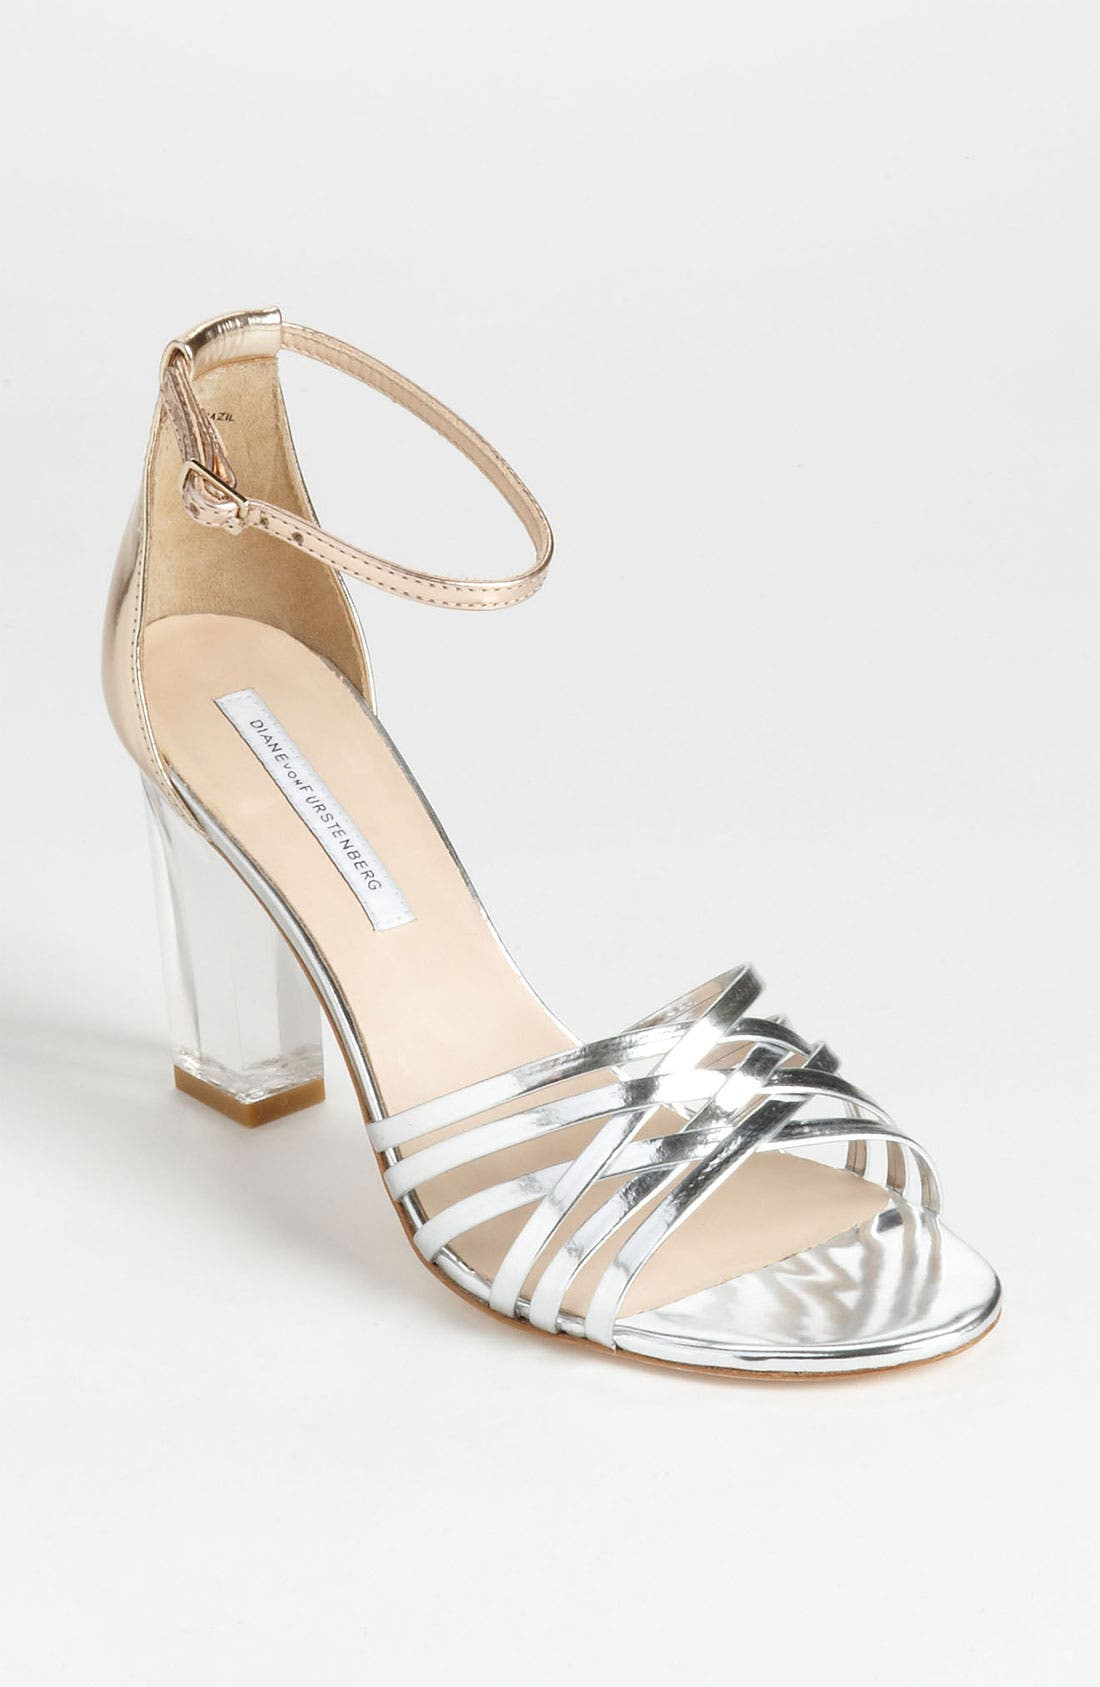 Alternate Image 1 Selected - Diane von Furstenberg 'Priene' Sandal (Online Only)